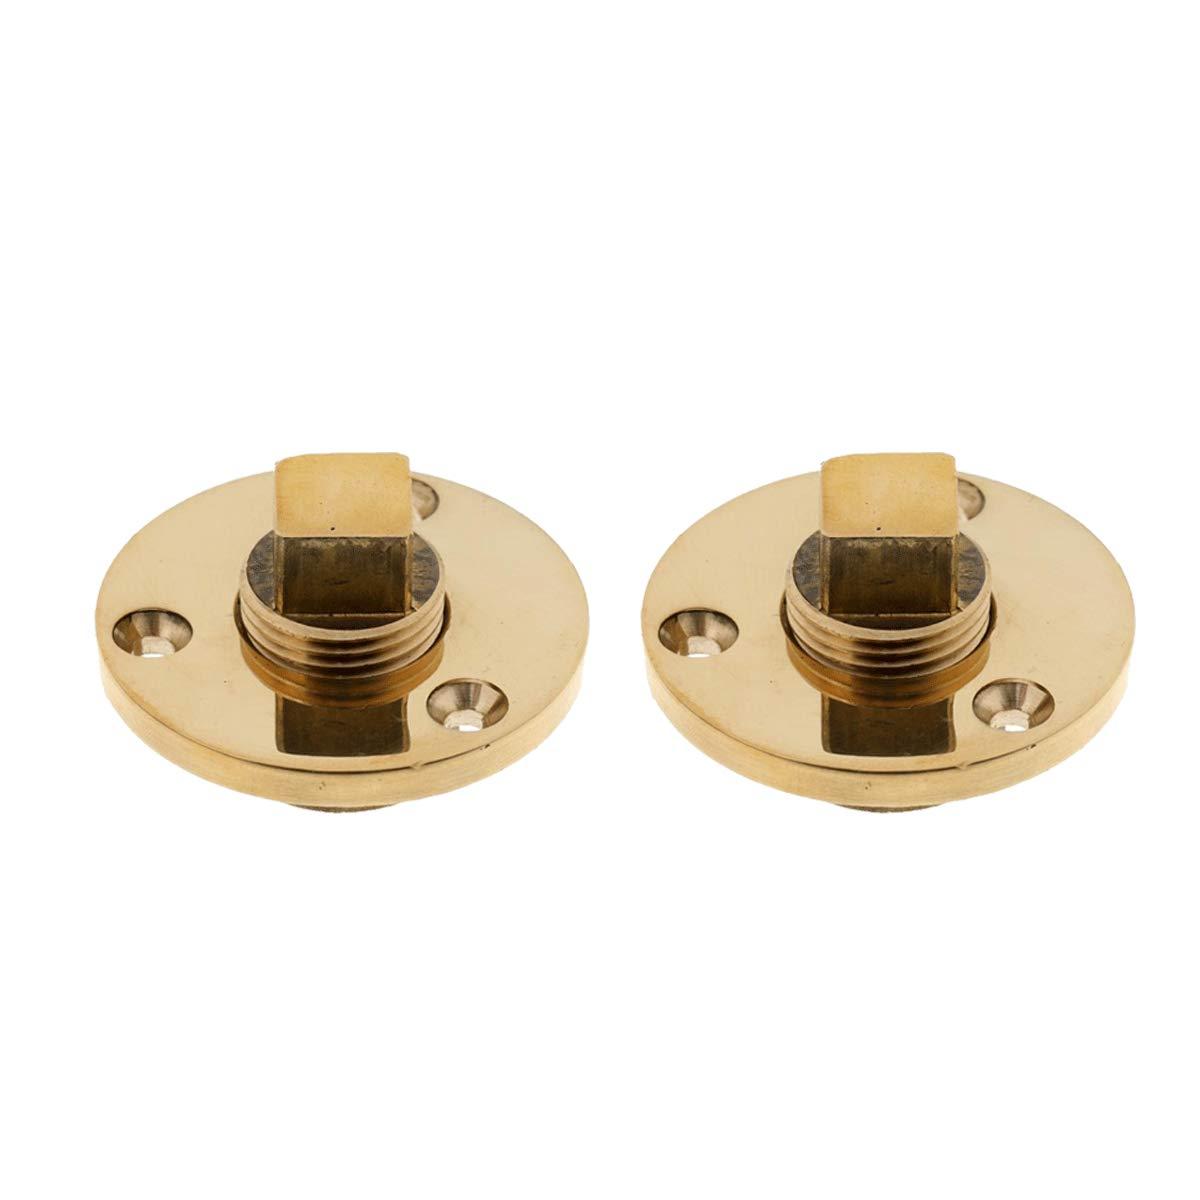 Boat Brass drain plug bilge drian plug Garboard Drain /& Plug threaded drain